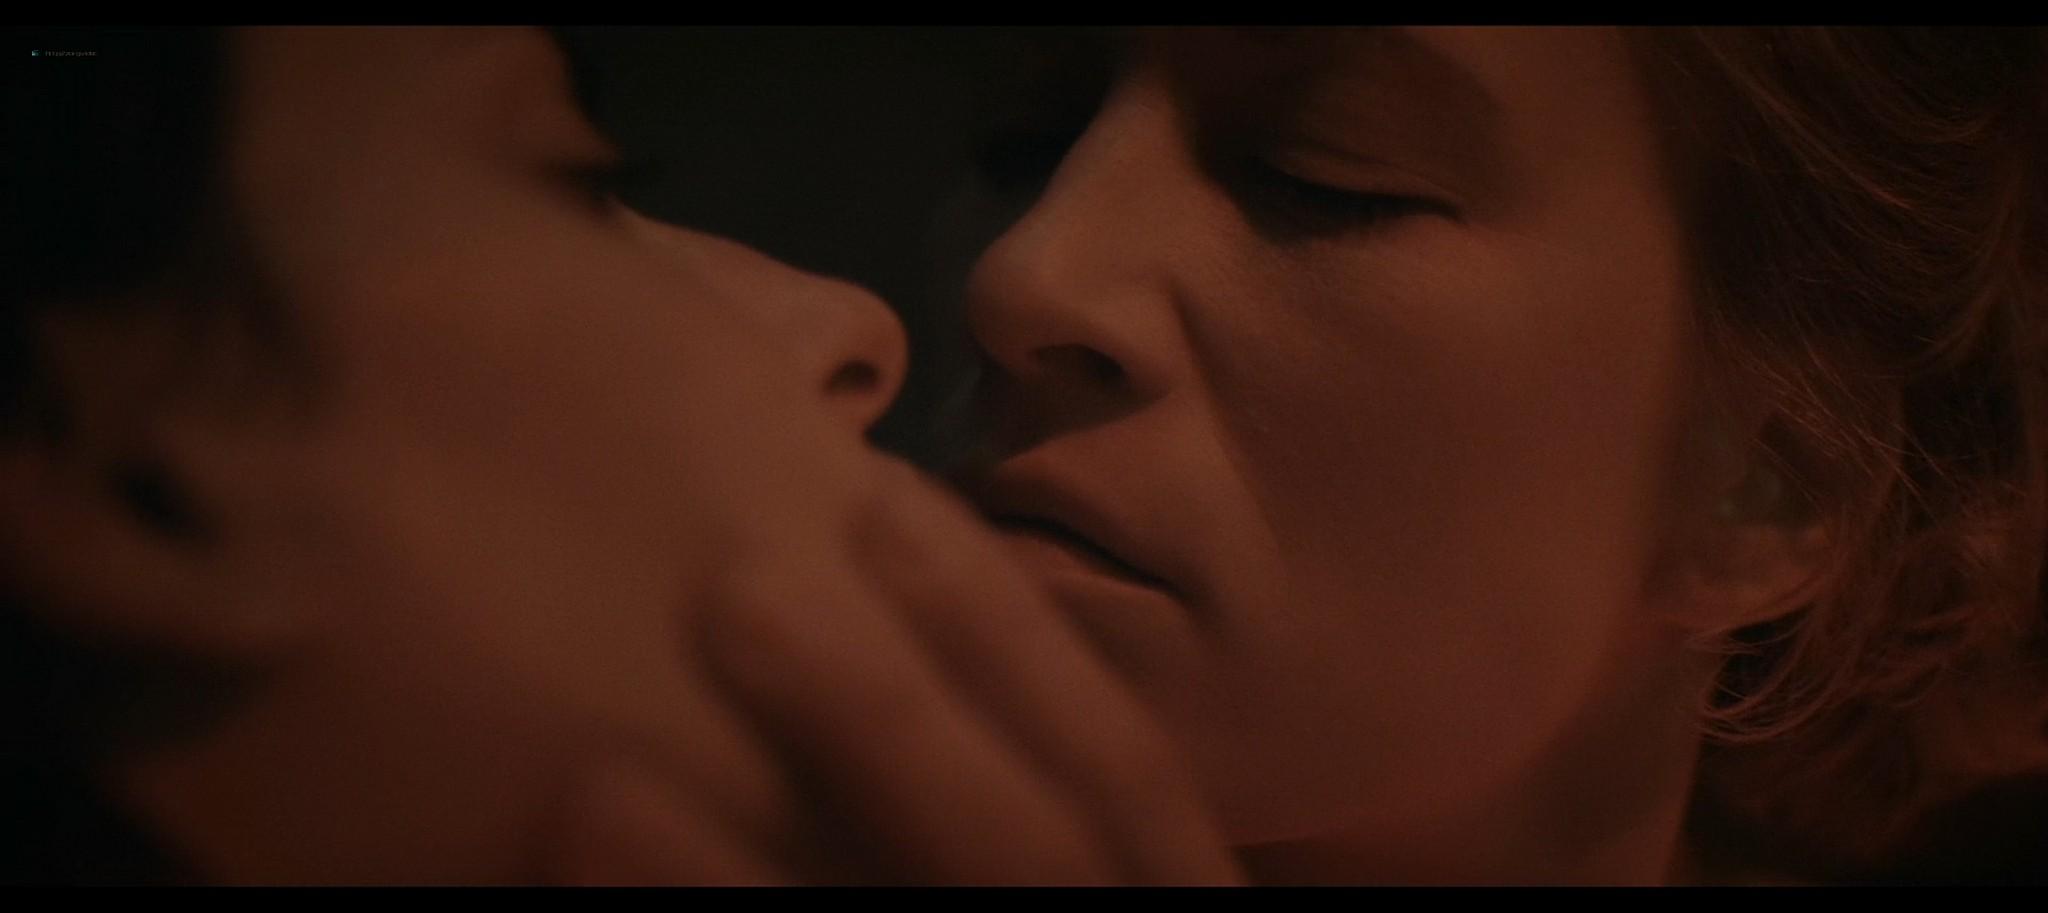 Clemence Thioly nude sex Helena Dvorakova nude lesbian sex Colette 2013 1080p BluRay 12